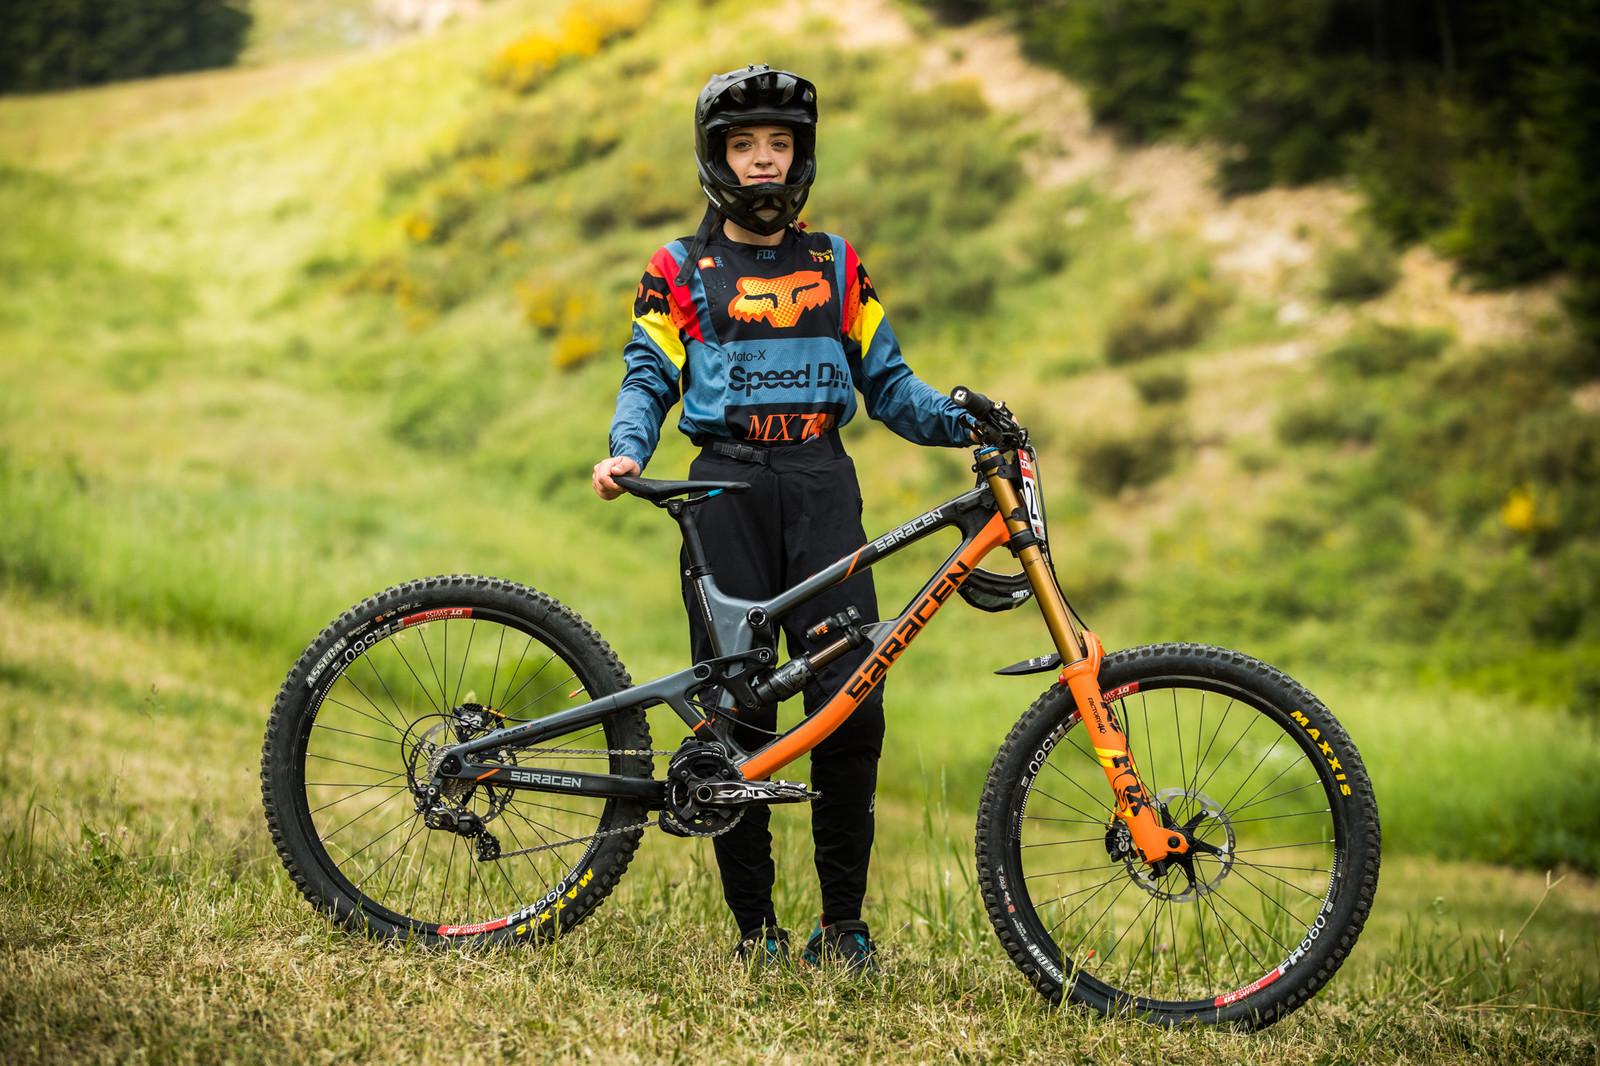 Izabela Yankova from Bulgaria with her Saracen Myst - 25 Downhill Bikes - iXS DH Cup #3 - Abetone - Mountain Biking Pictures - Vital MTB